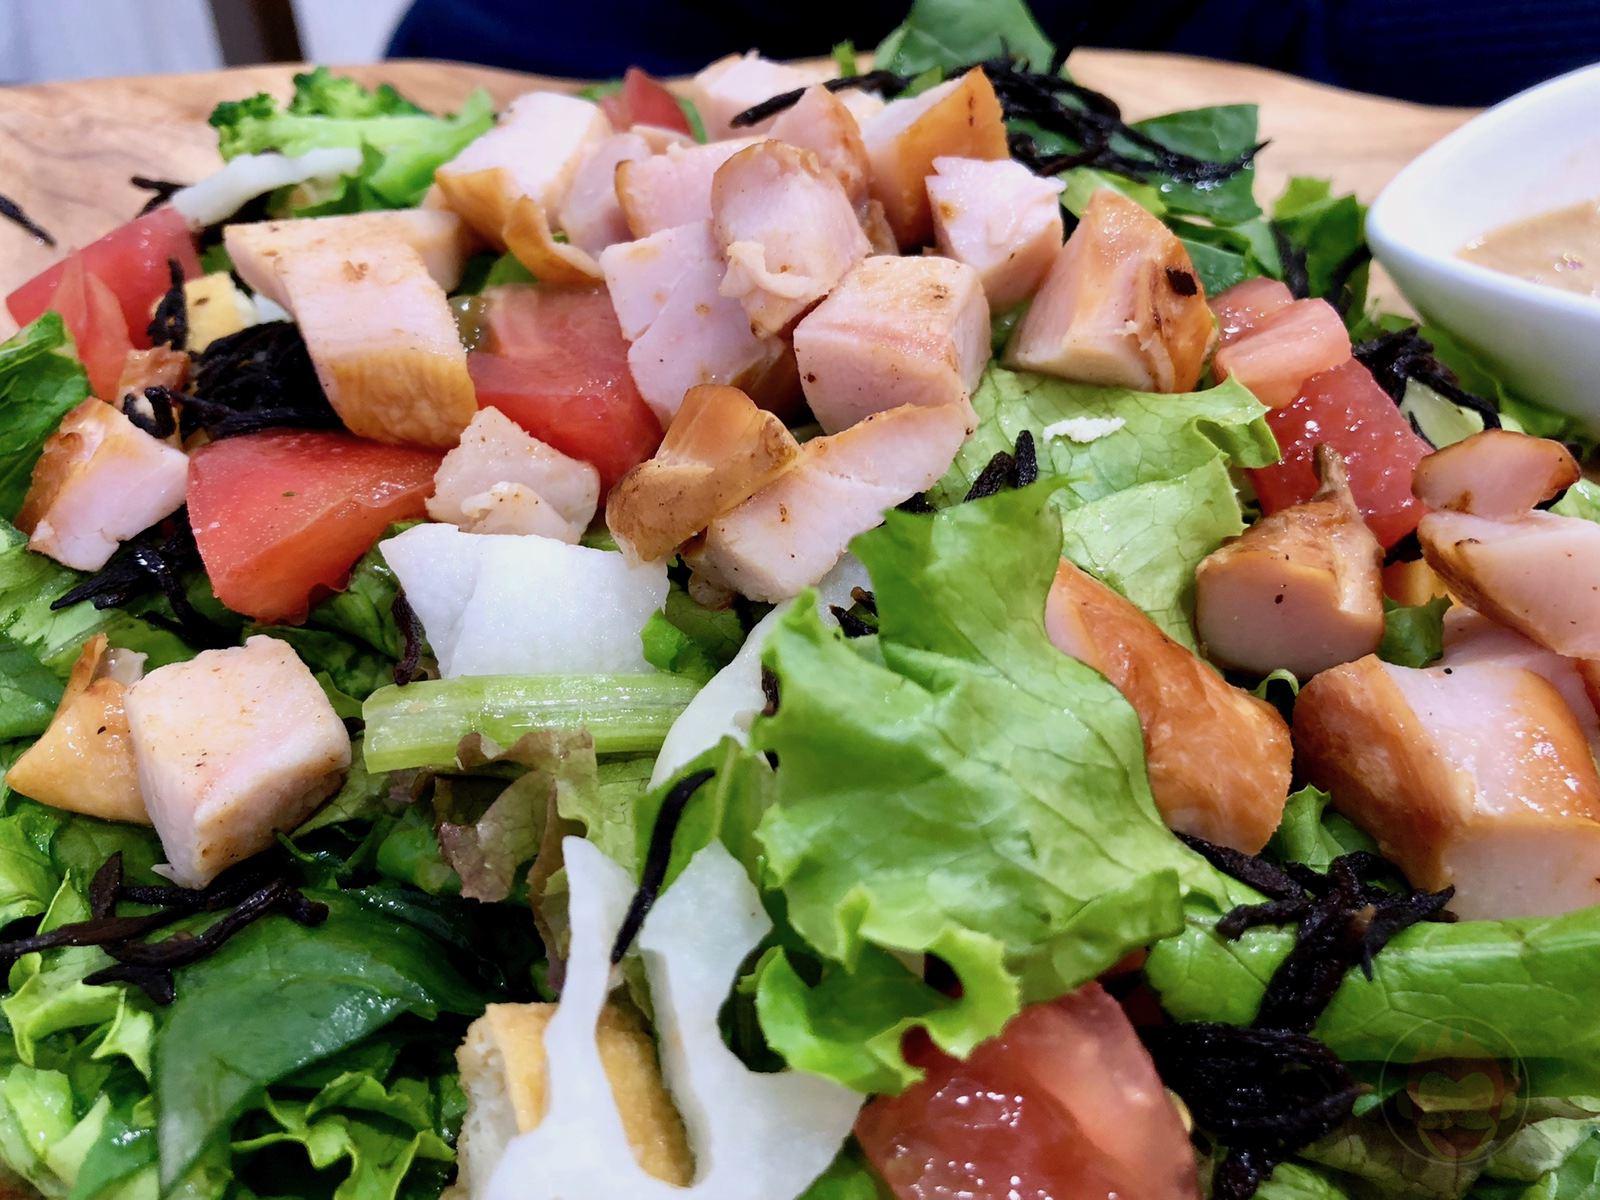 Hundred-Fruits-Salad-and-sweets-04.jpg